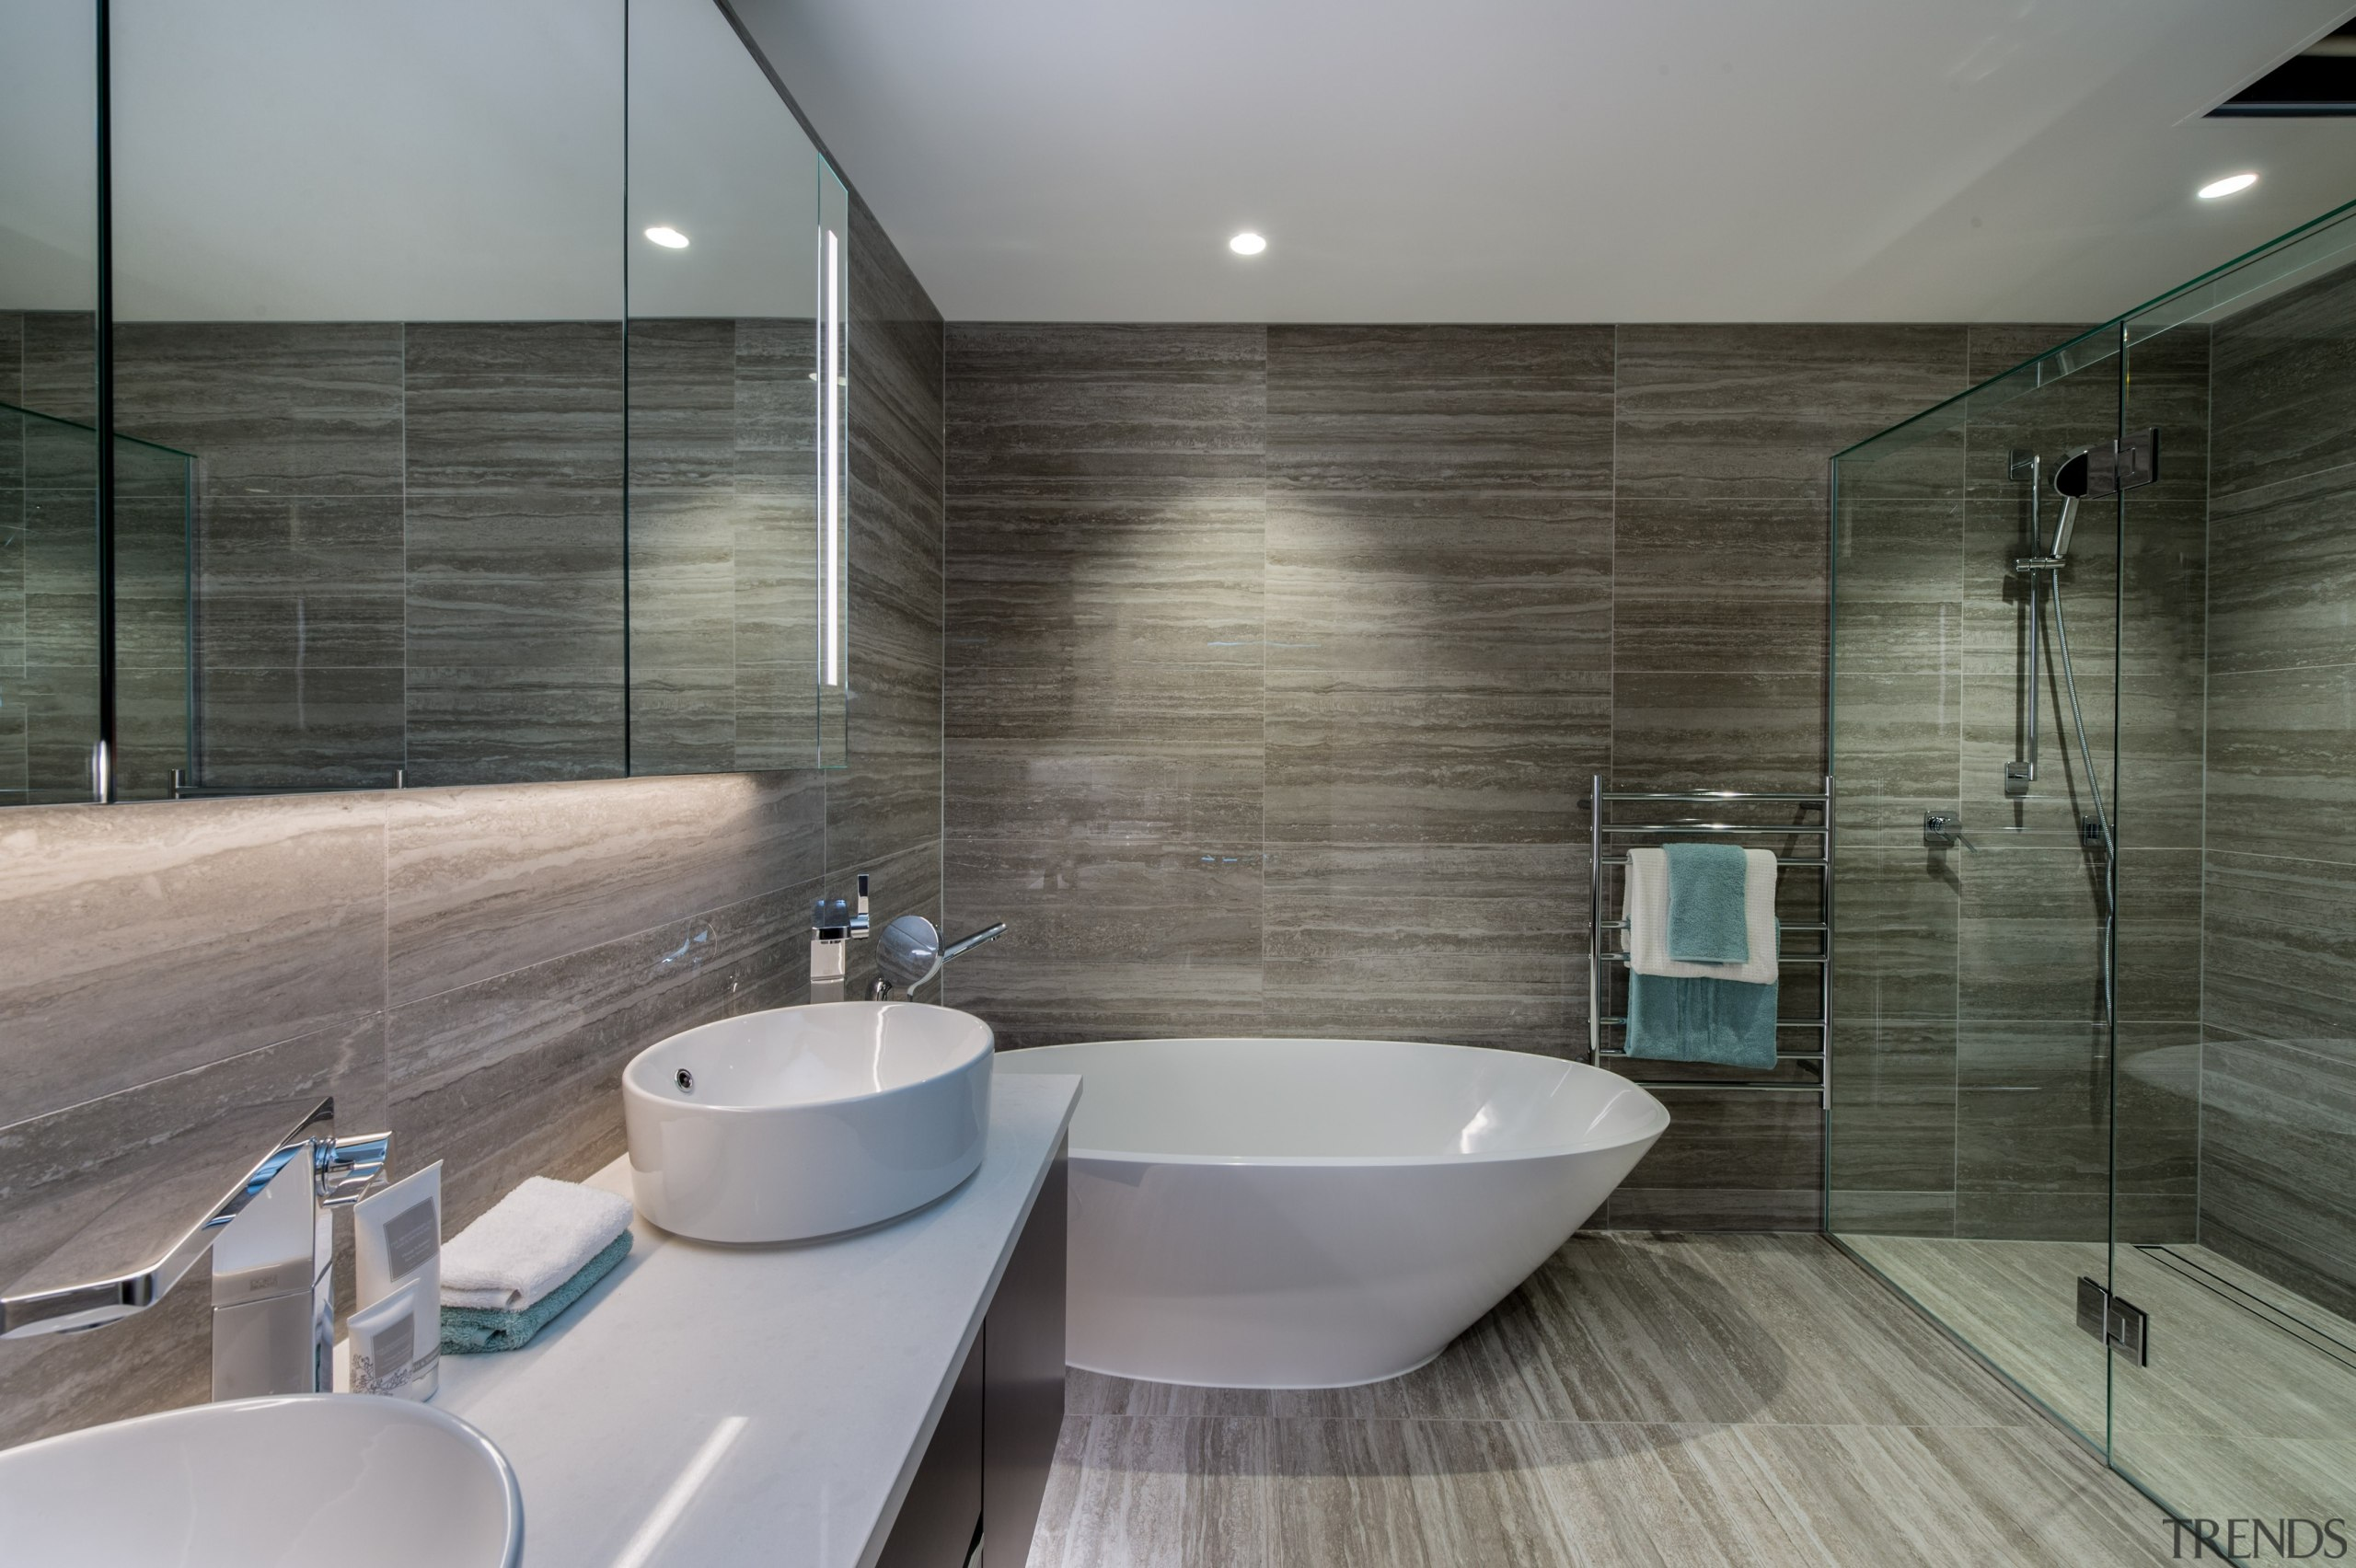 Bath - architecture | bathroom | floor | architecture, bathroom, floor, interior design, room, tile, gray, black